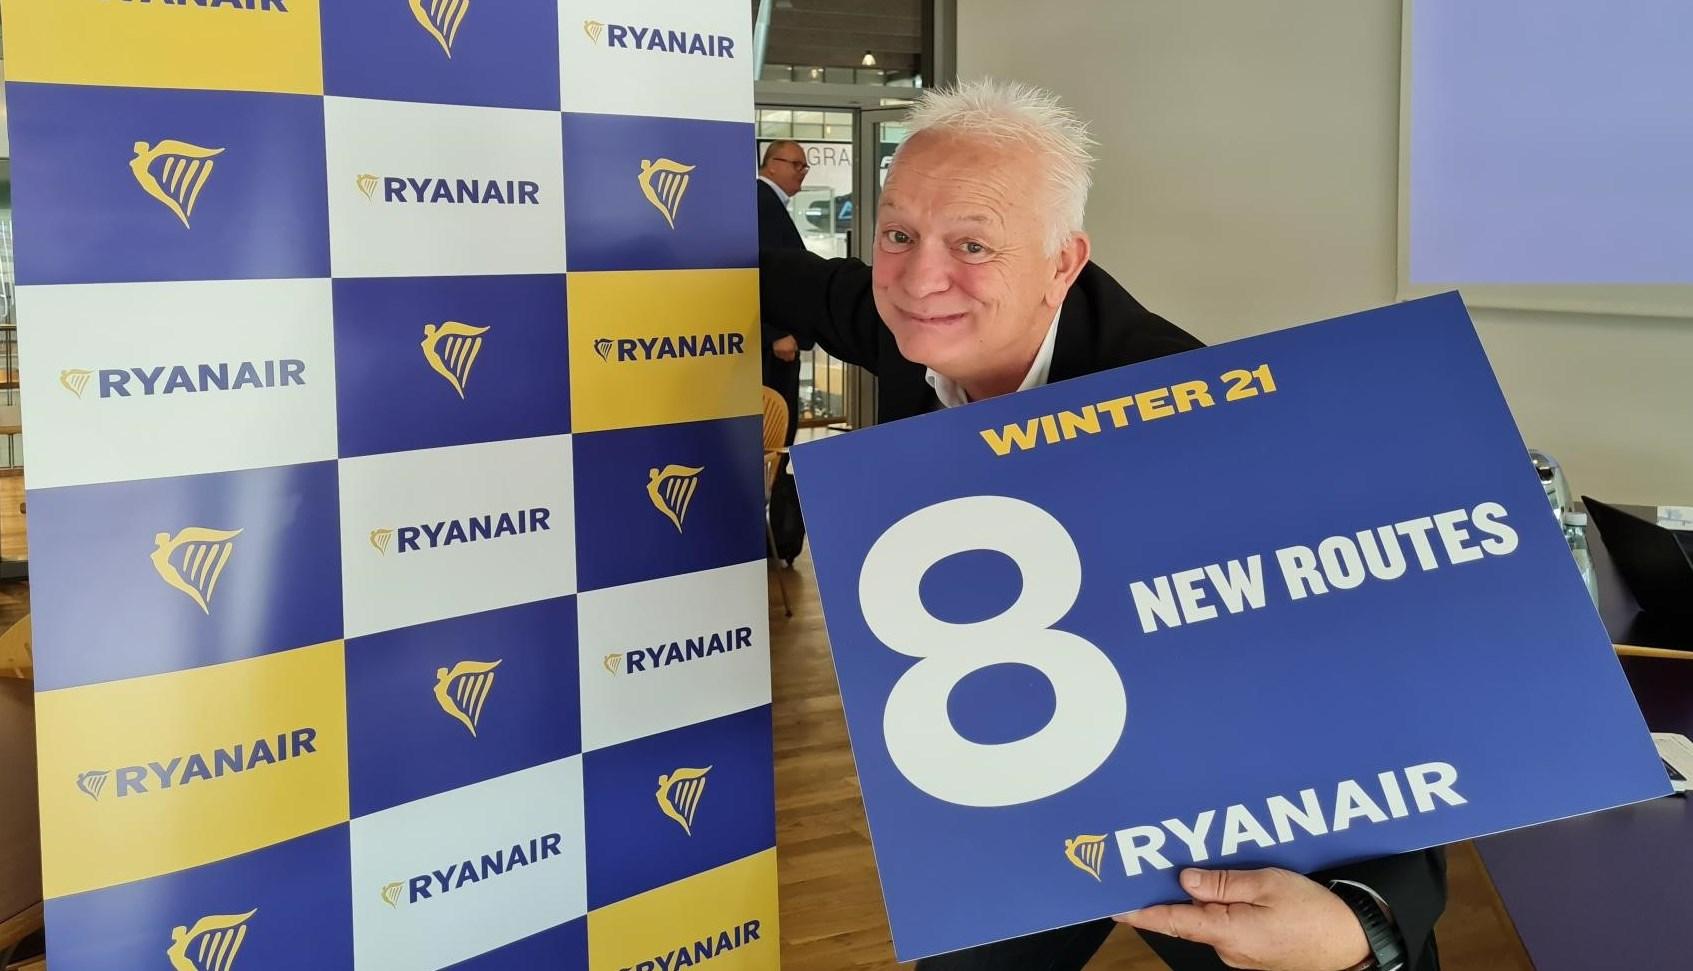 Eddie Wilson, administrerende direktør i Ryanair DAC. (Foto: Ryanair)